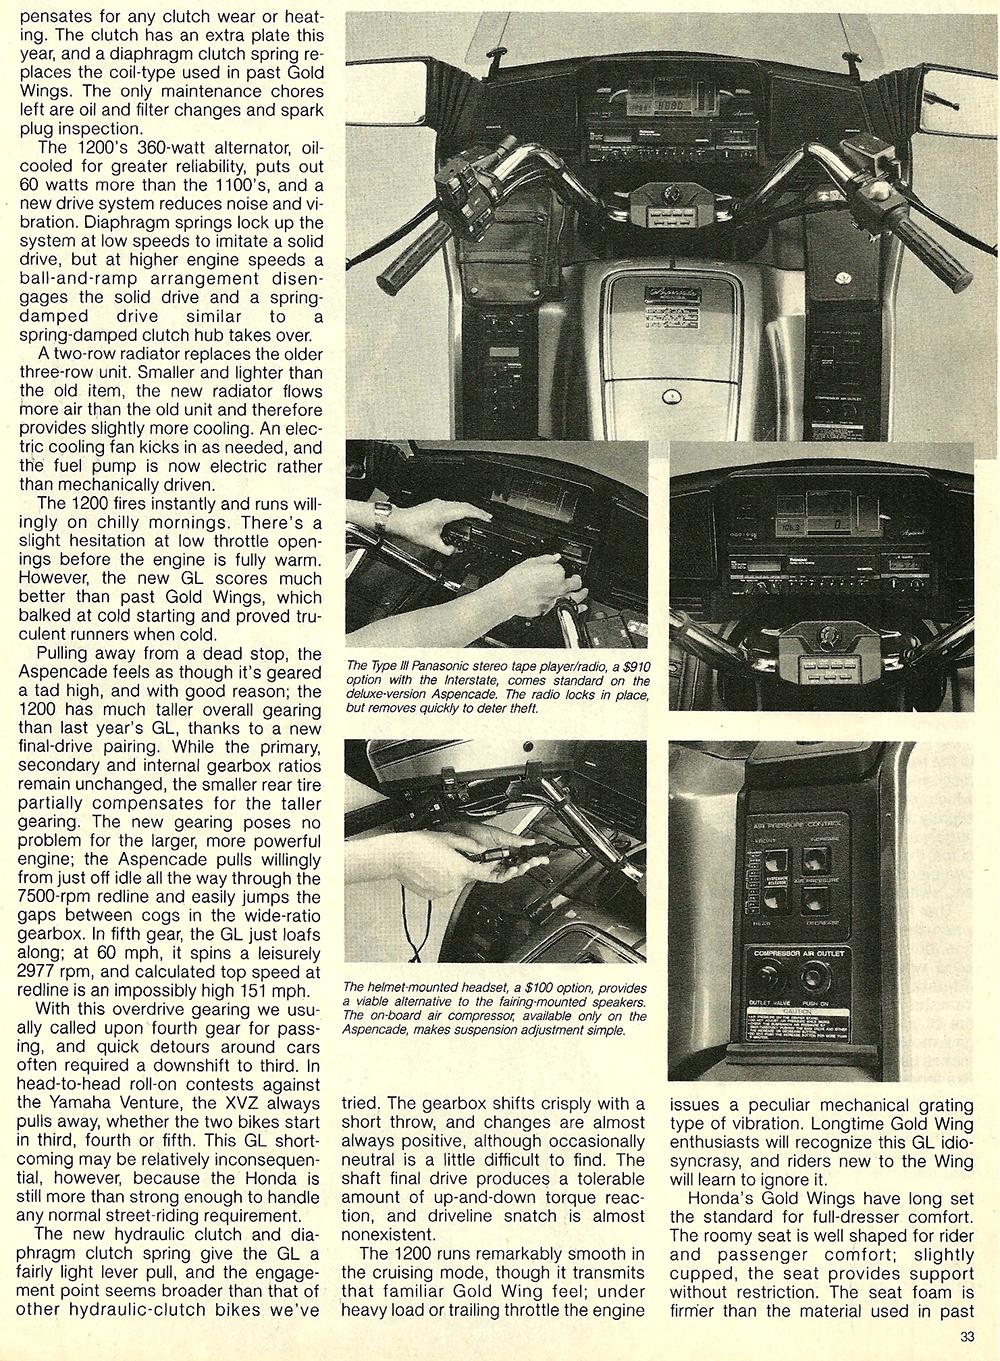 1984 Honda GL1200A Gold Wing Aspencade road test 6.jpg